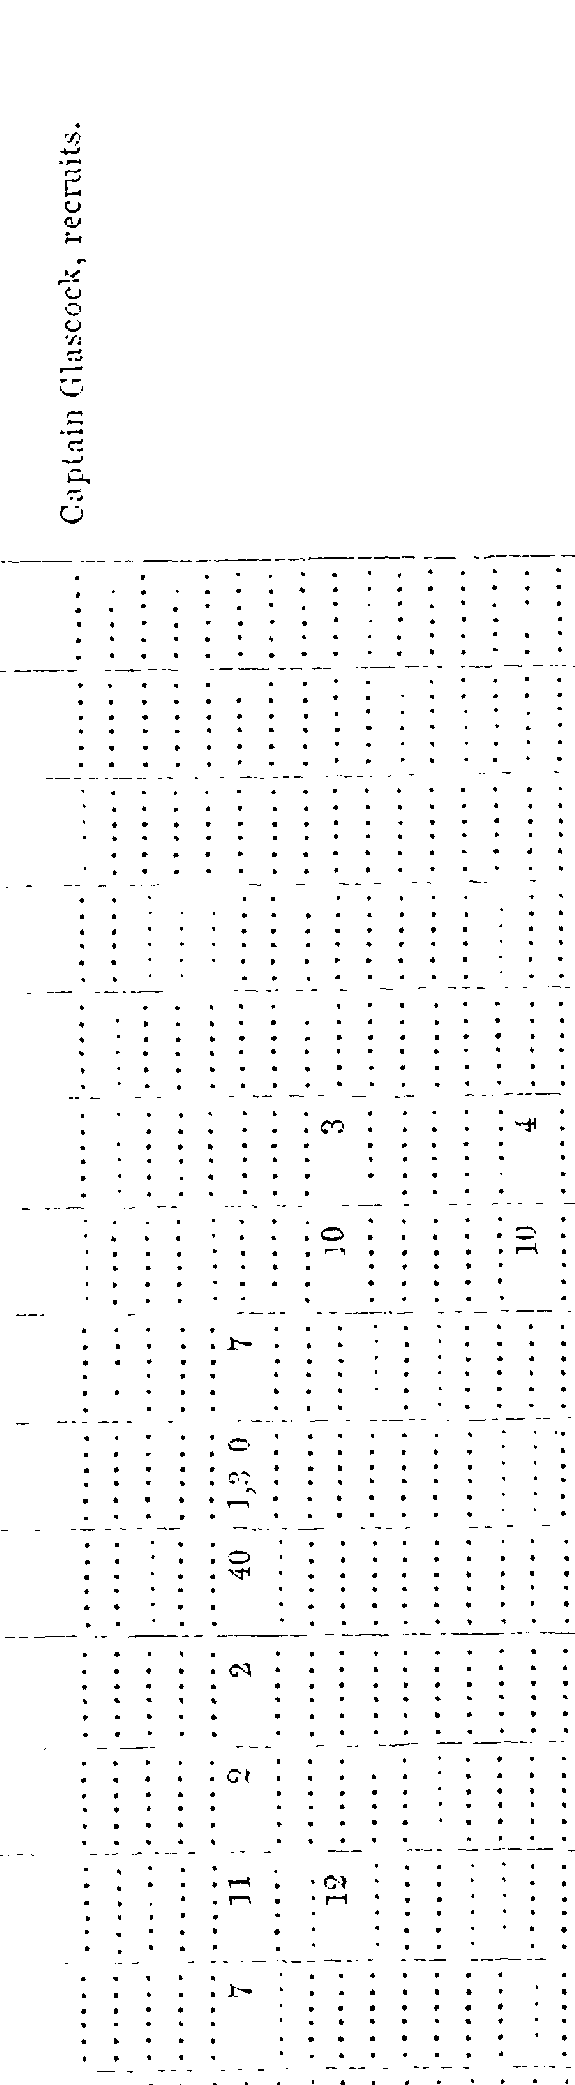 [ocr errors][merged small][ocr errors][merged small][merged small][ocr errors][merged small][merged small][merged small][ocr errors][ocr errors][merged small][merged small][ocr errors][ocr errors]